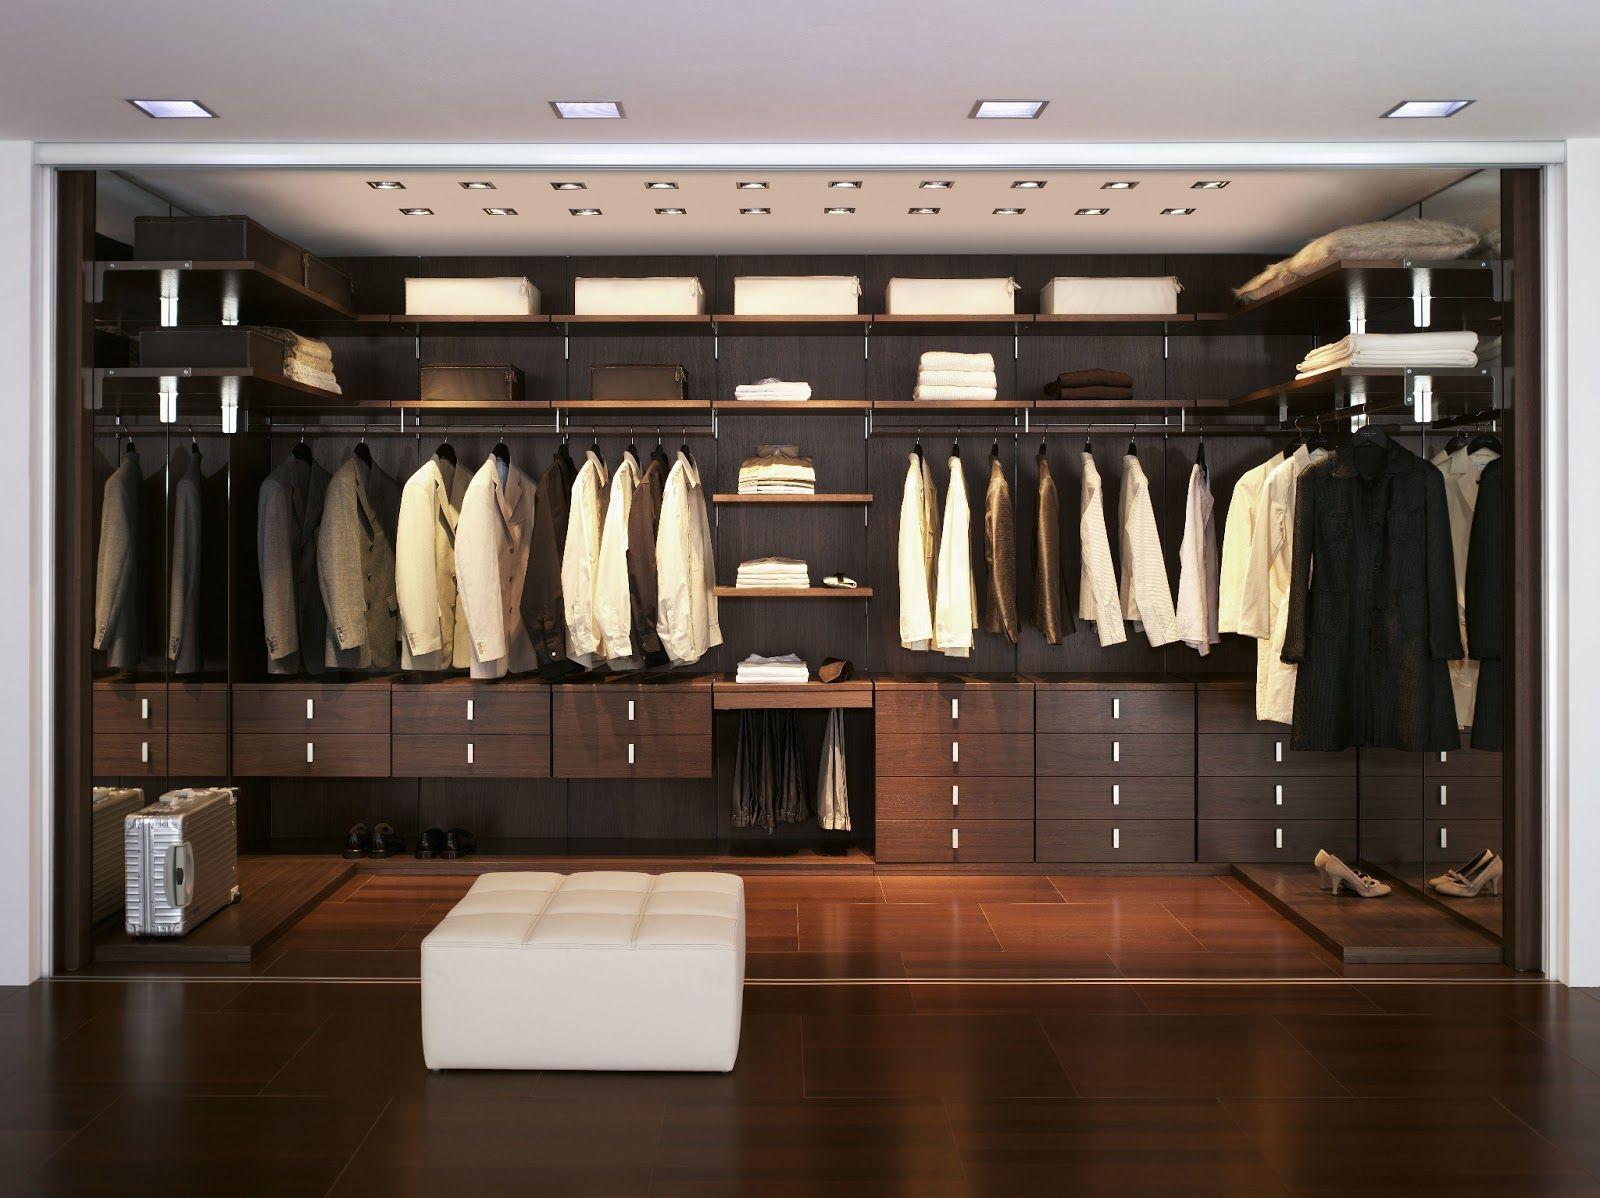 Interior Design Master Bedroom Modernmasterbedroomsinteriordesignmasterbedroomwardrobe